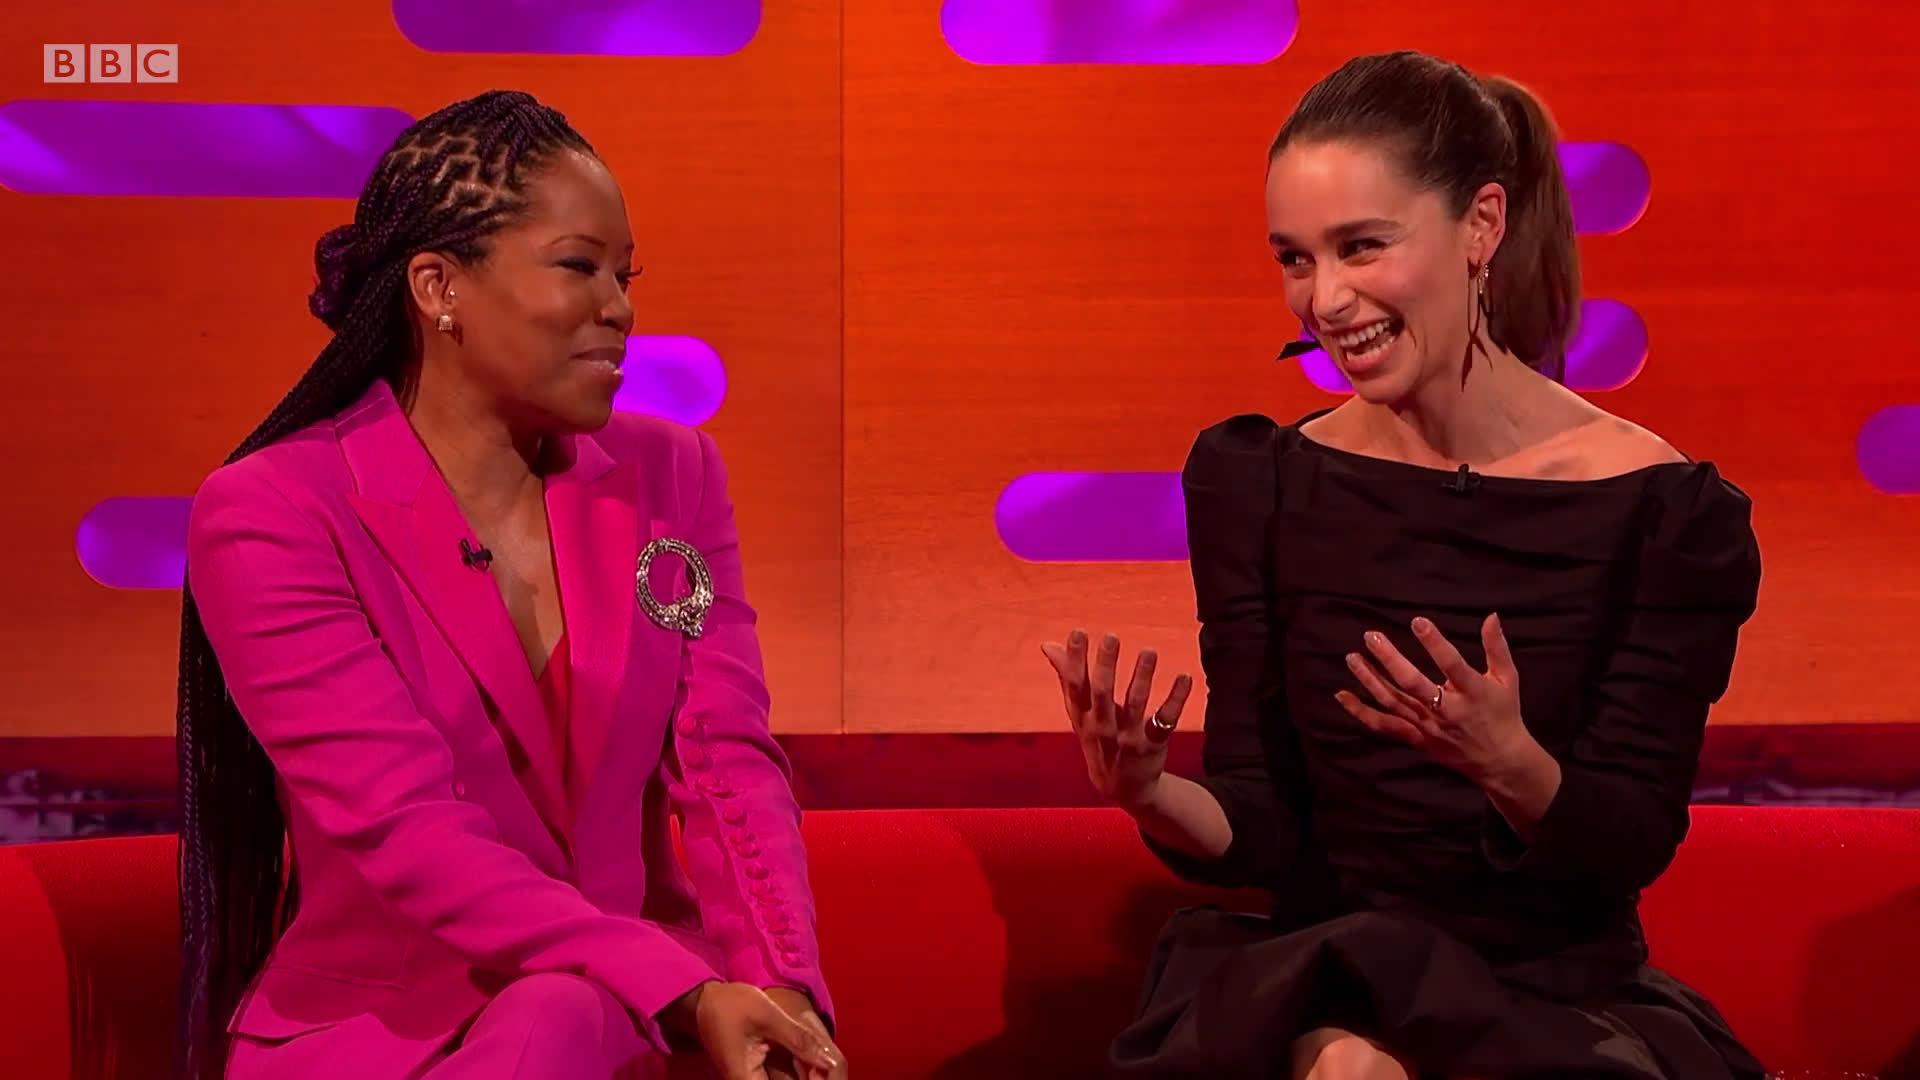 Emilia回忆受邀参加碧昂斯的派对